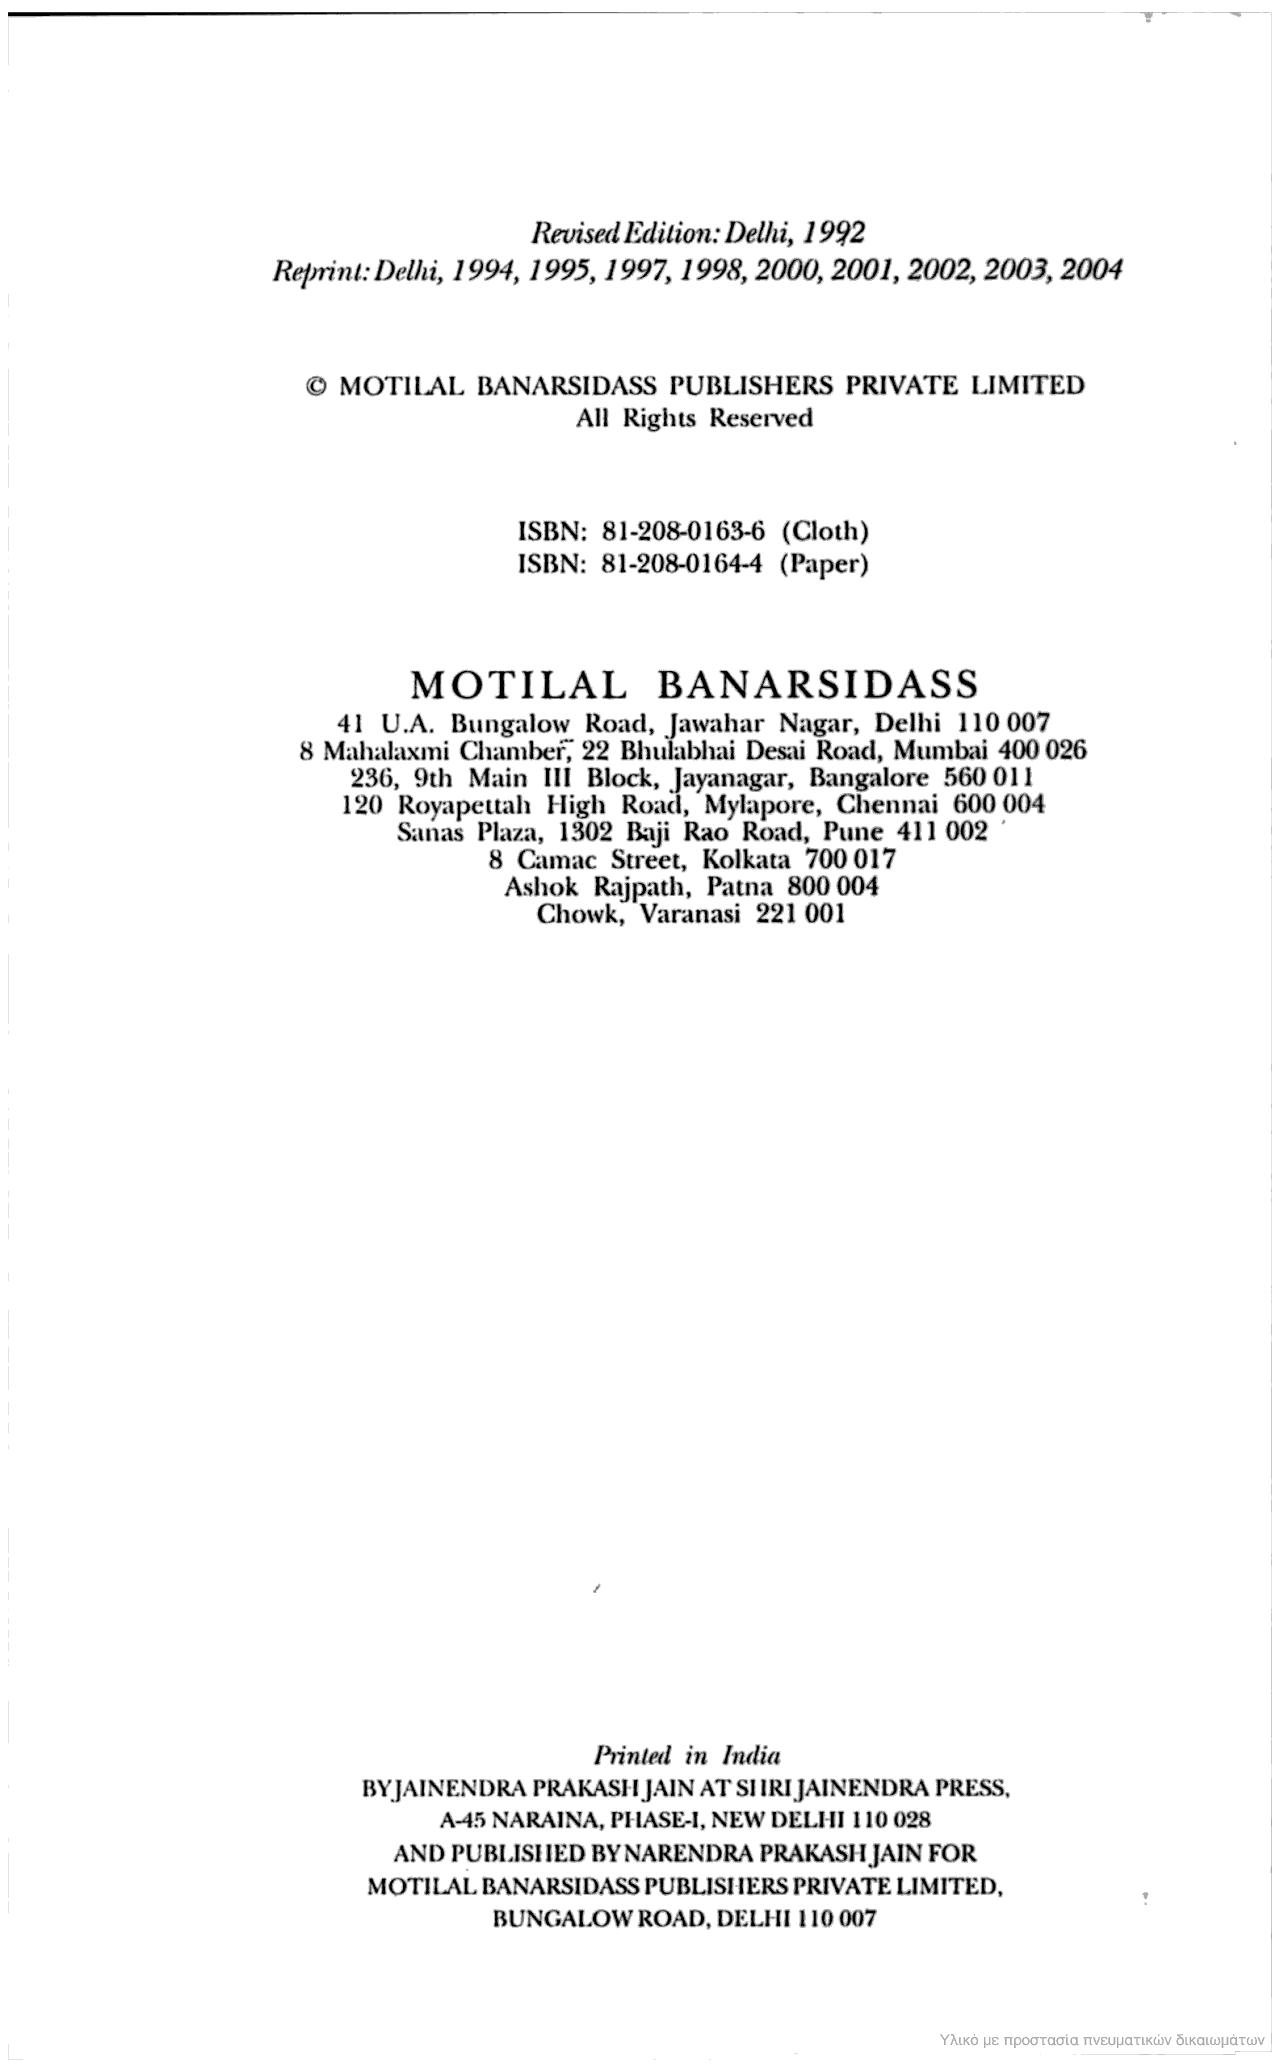 Agrawala vedic mathematics - swami bharati krishna tirtha, vasudeva